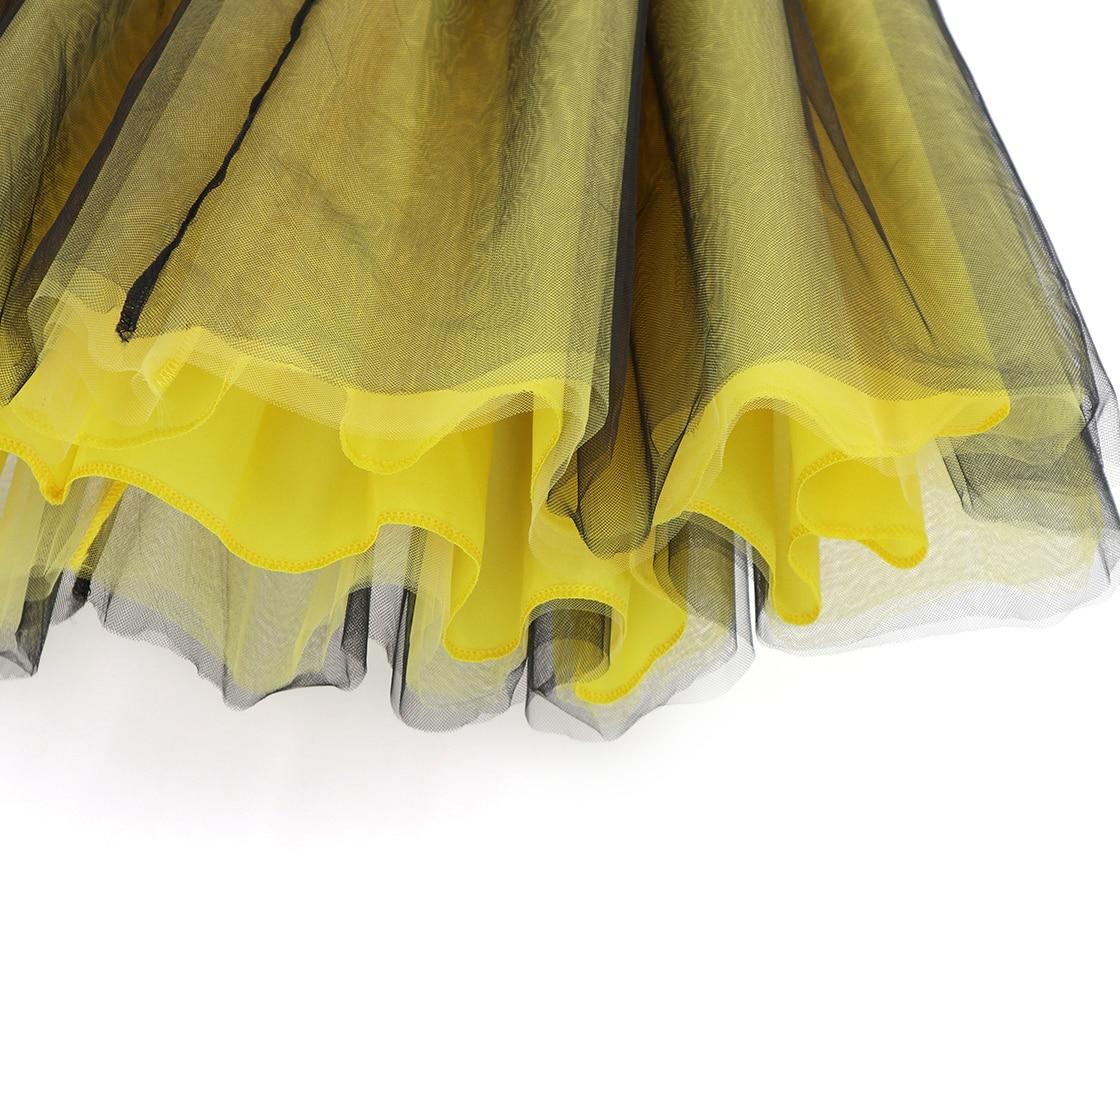 b24d82e73 De 6 capas de tul falda Tutu faldas amarillo para mujer Lolita falda de  falda Jupe párr tallas grandes faldas